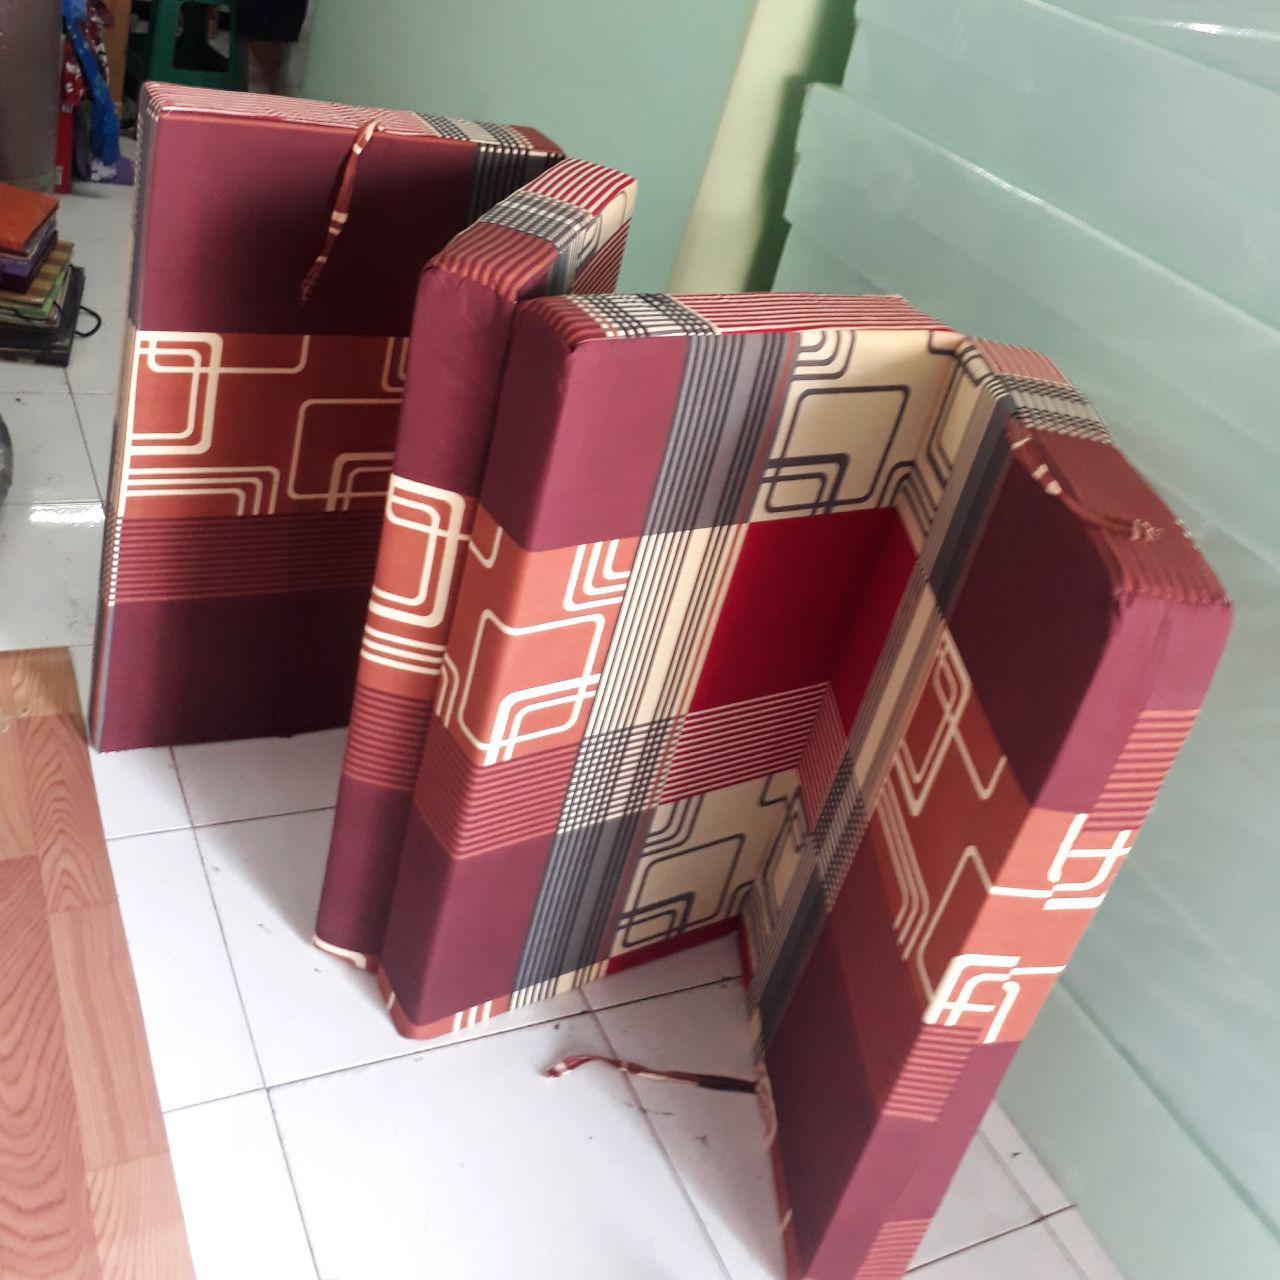 harga sofa bed inoac cikarang bassett sofas jual kasur busa bekasi 085729224088